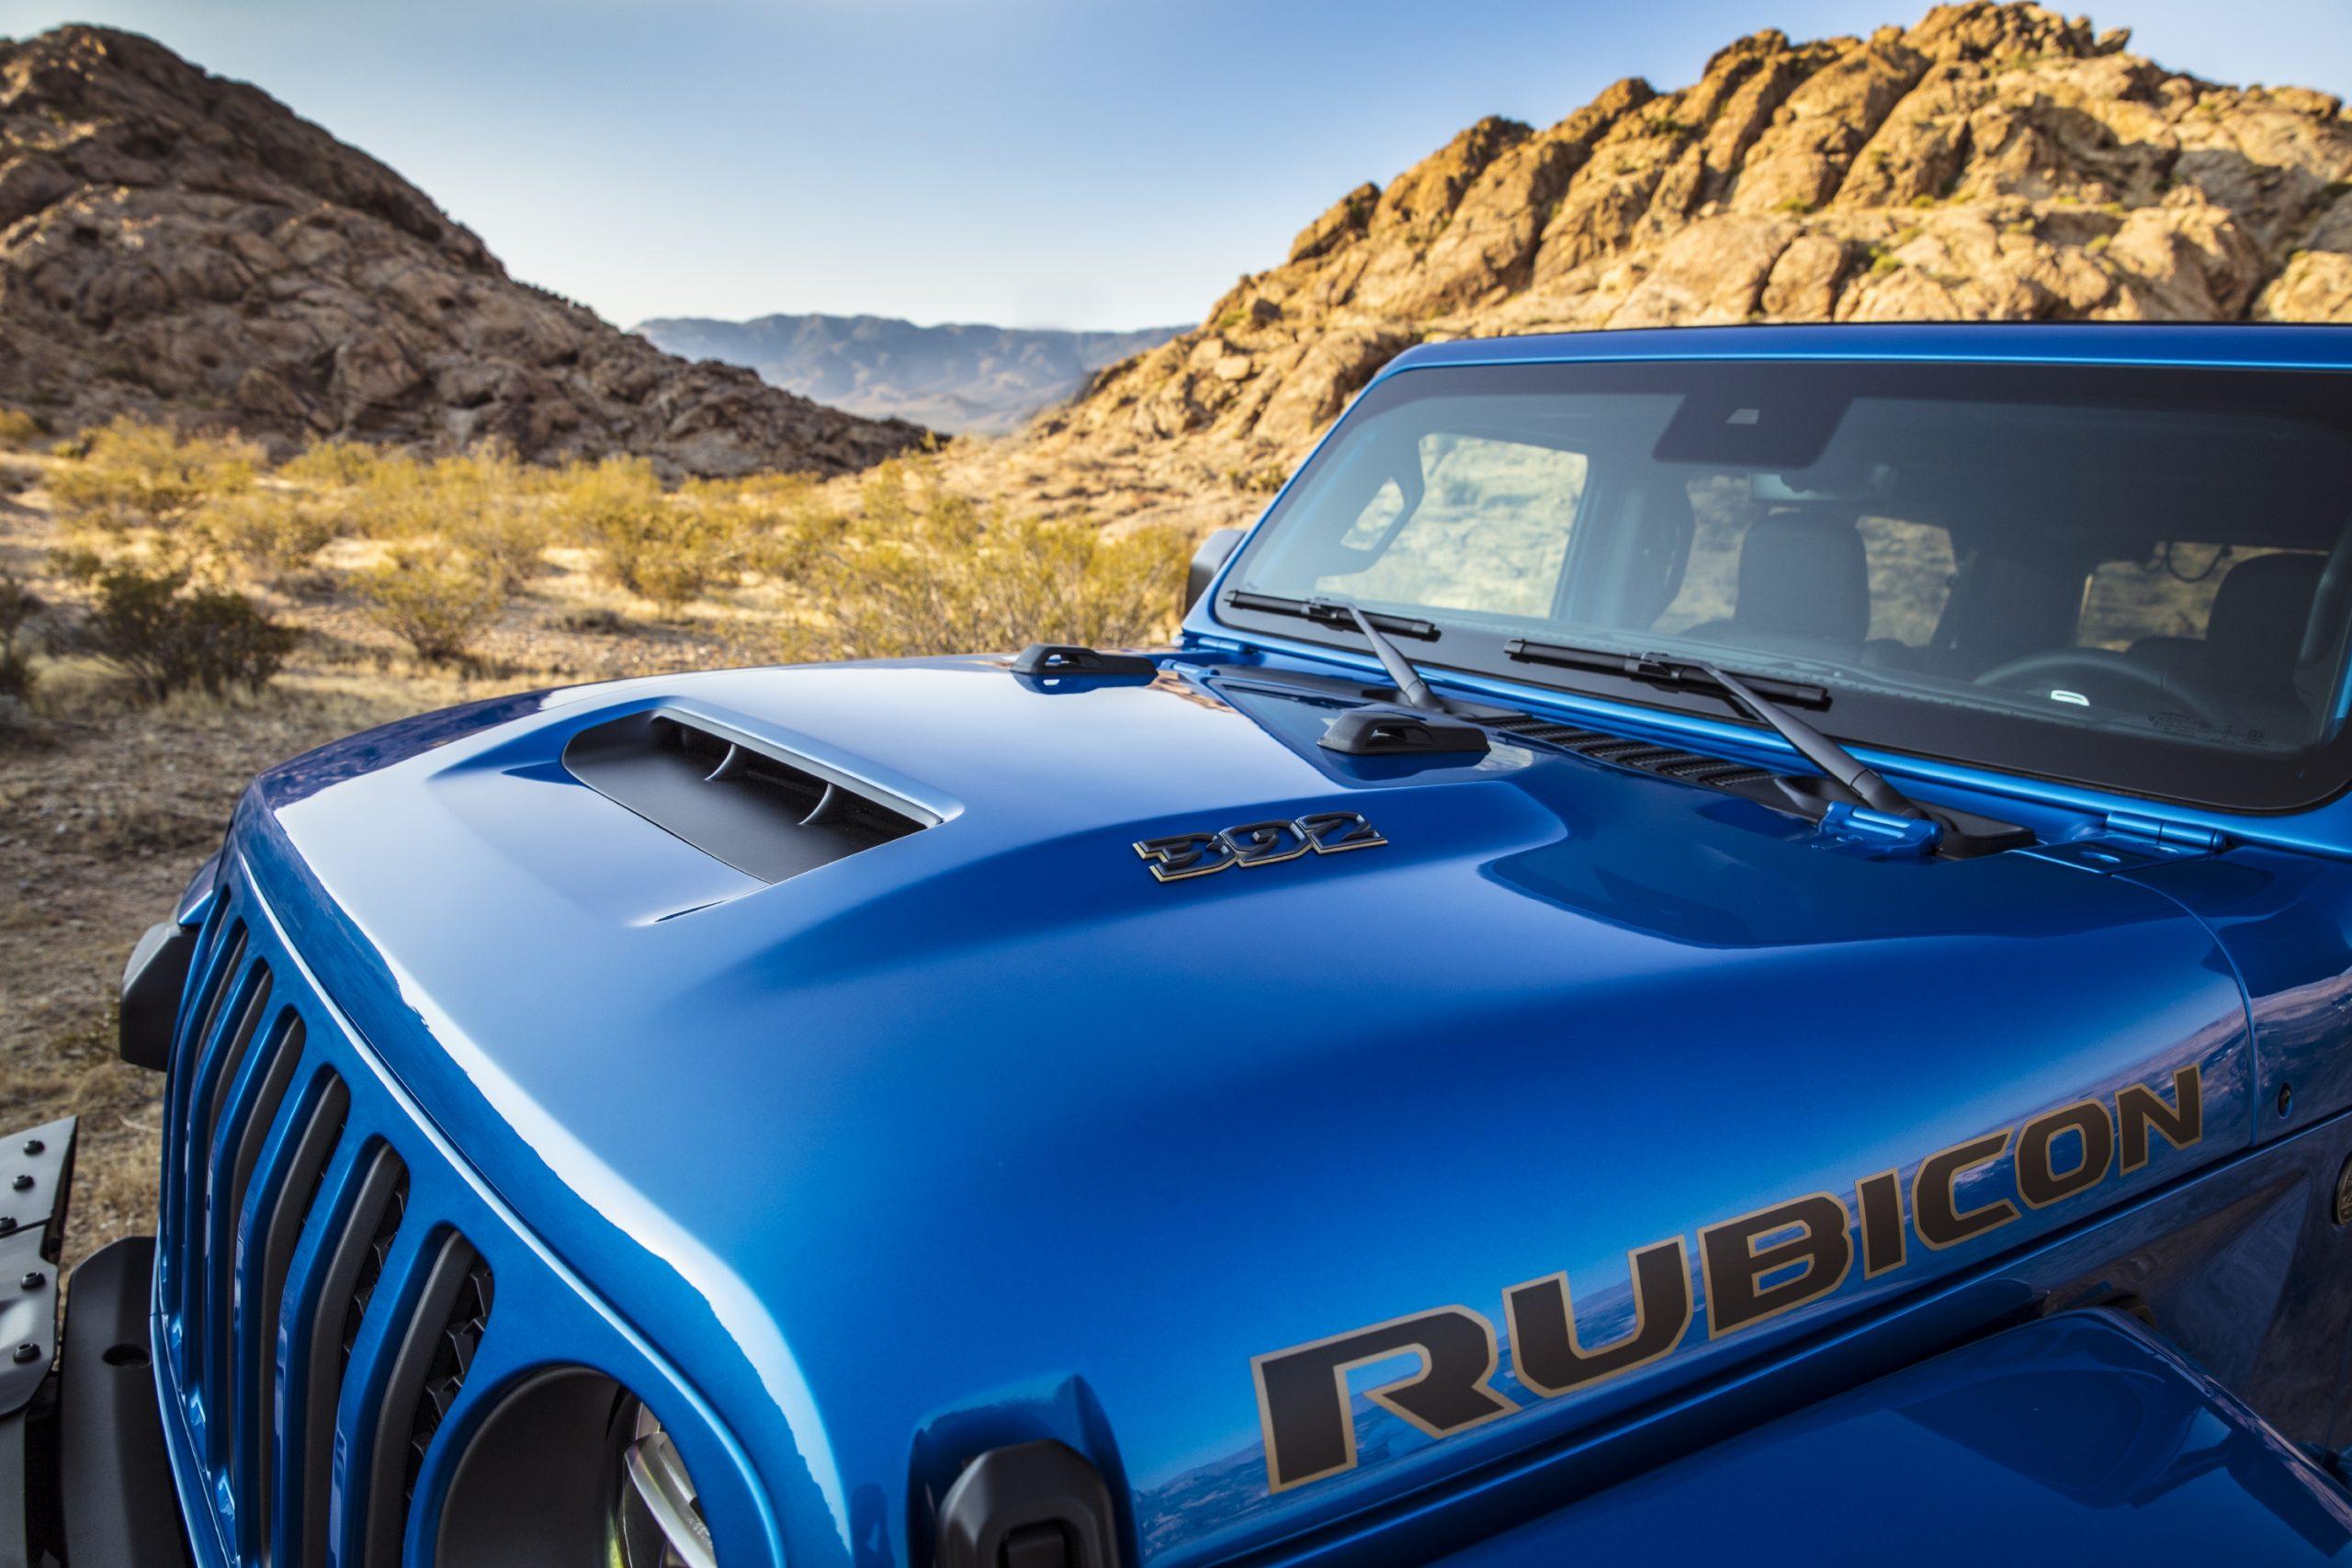 2021 Jeep Wrangler Rubicon 392 hood